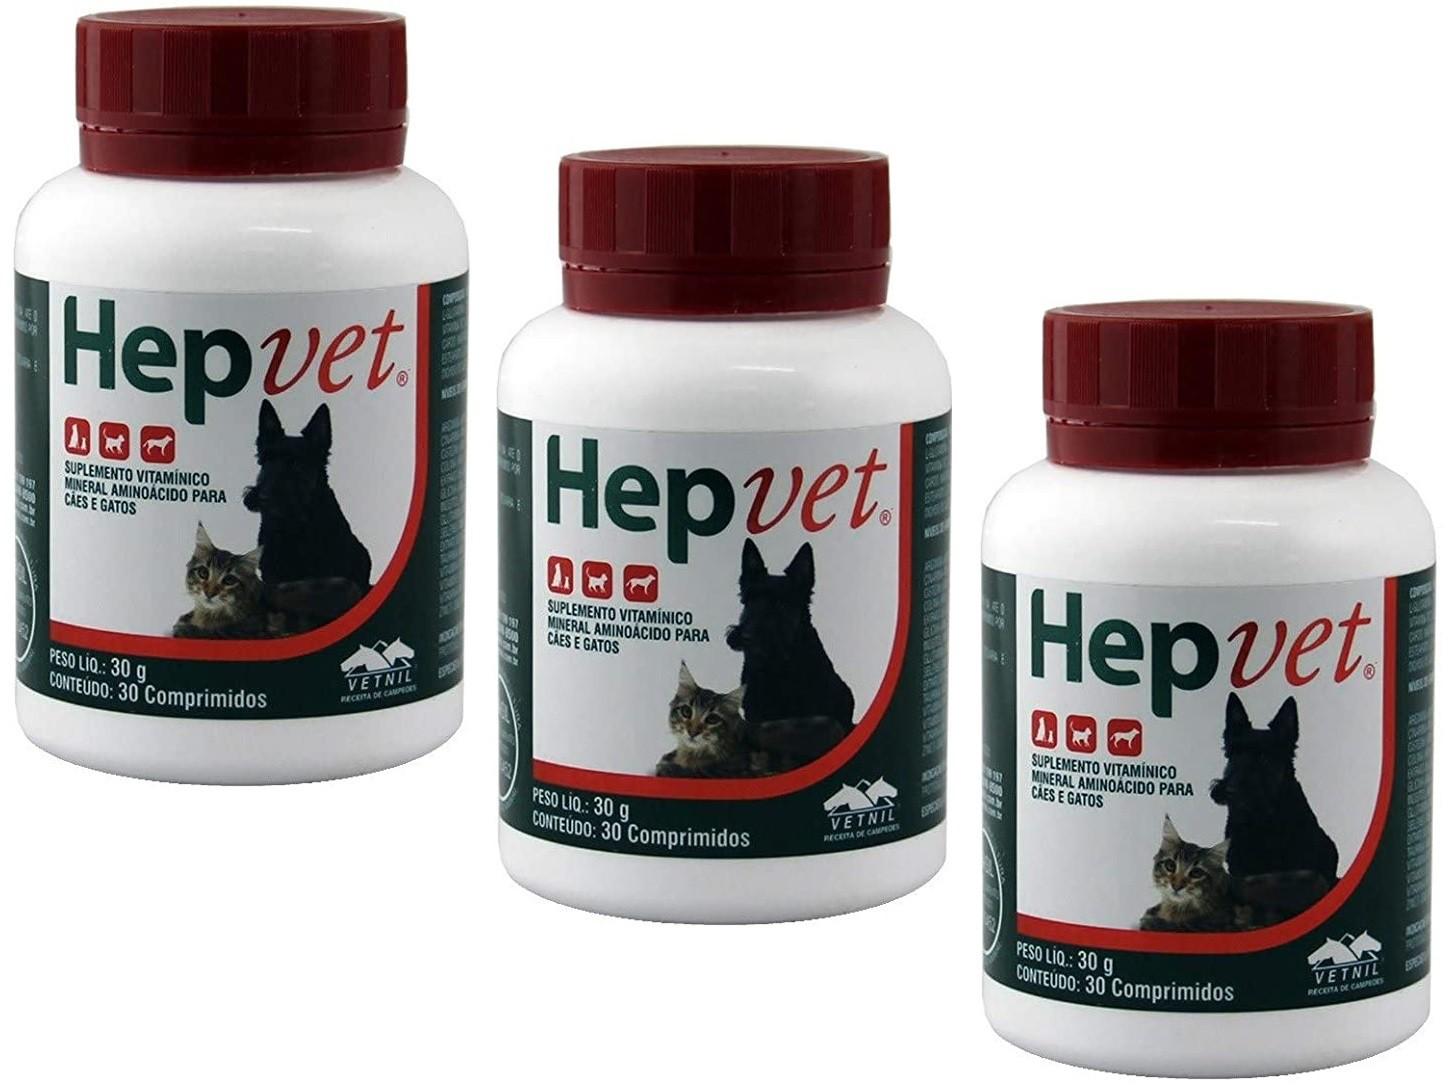 Kit 3 Unidades Suplemento Vitaminico Hepvet 30g (30 Comprimidos) - Vetnil